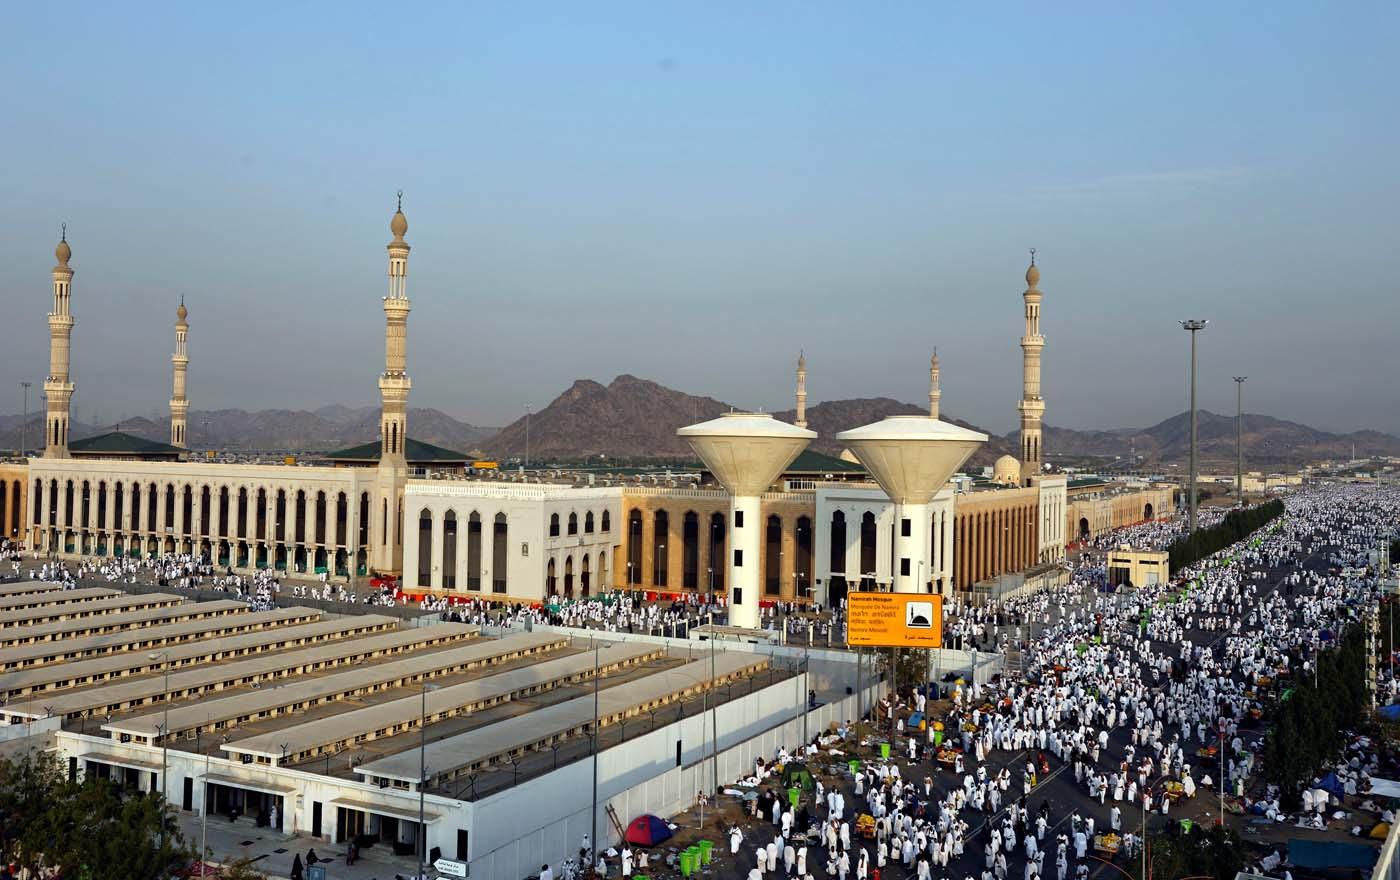 Muslim pilgrims gather near Namira Mosque on the plains of Arafat during the annual haj pilgrimage, outside the holy city of Mecca, Saudi Arabia August 31, 2017.  REUTERS/Suhaib Salem